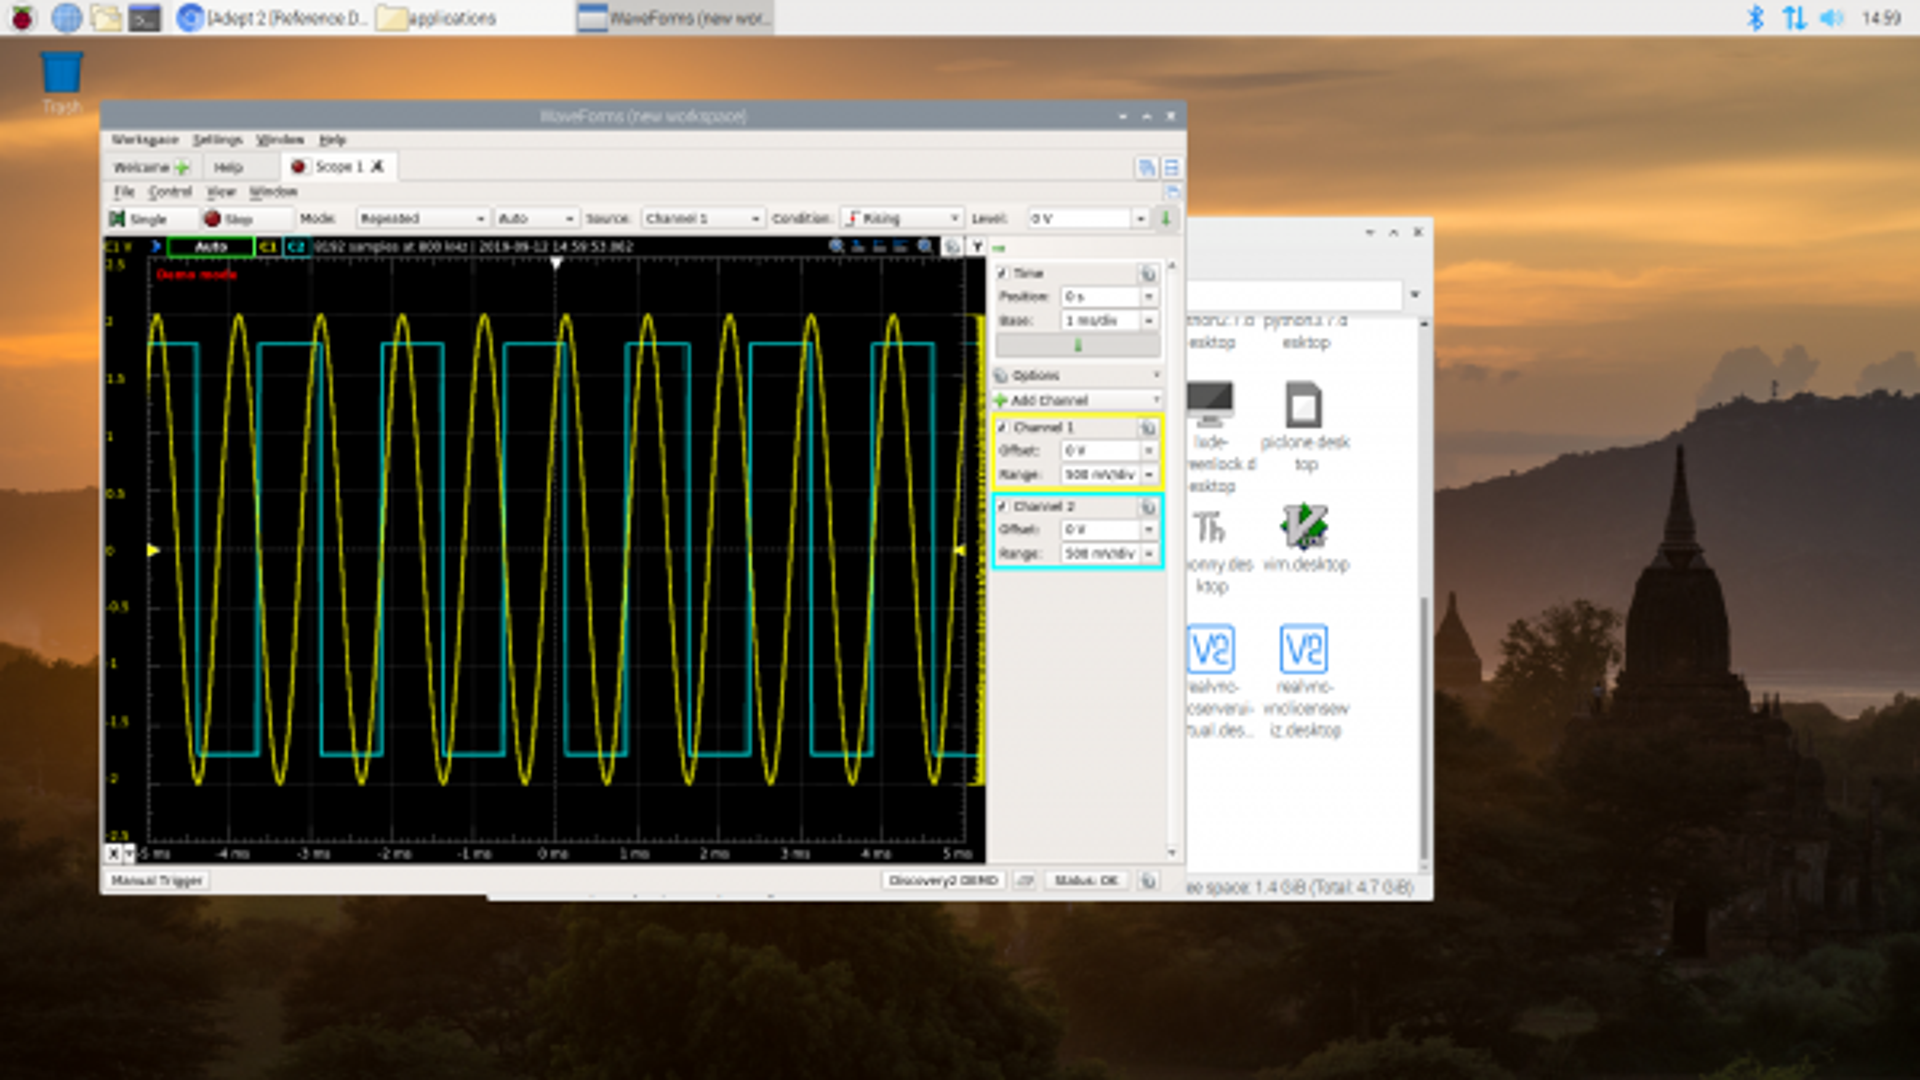 Demo mode oscilloscope.